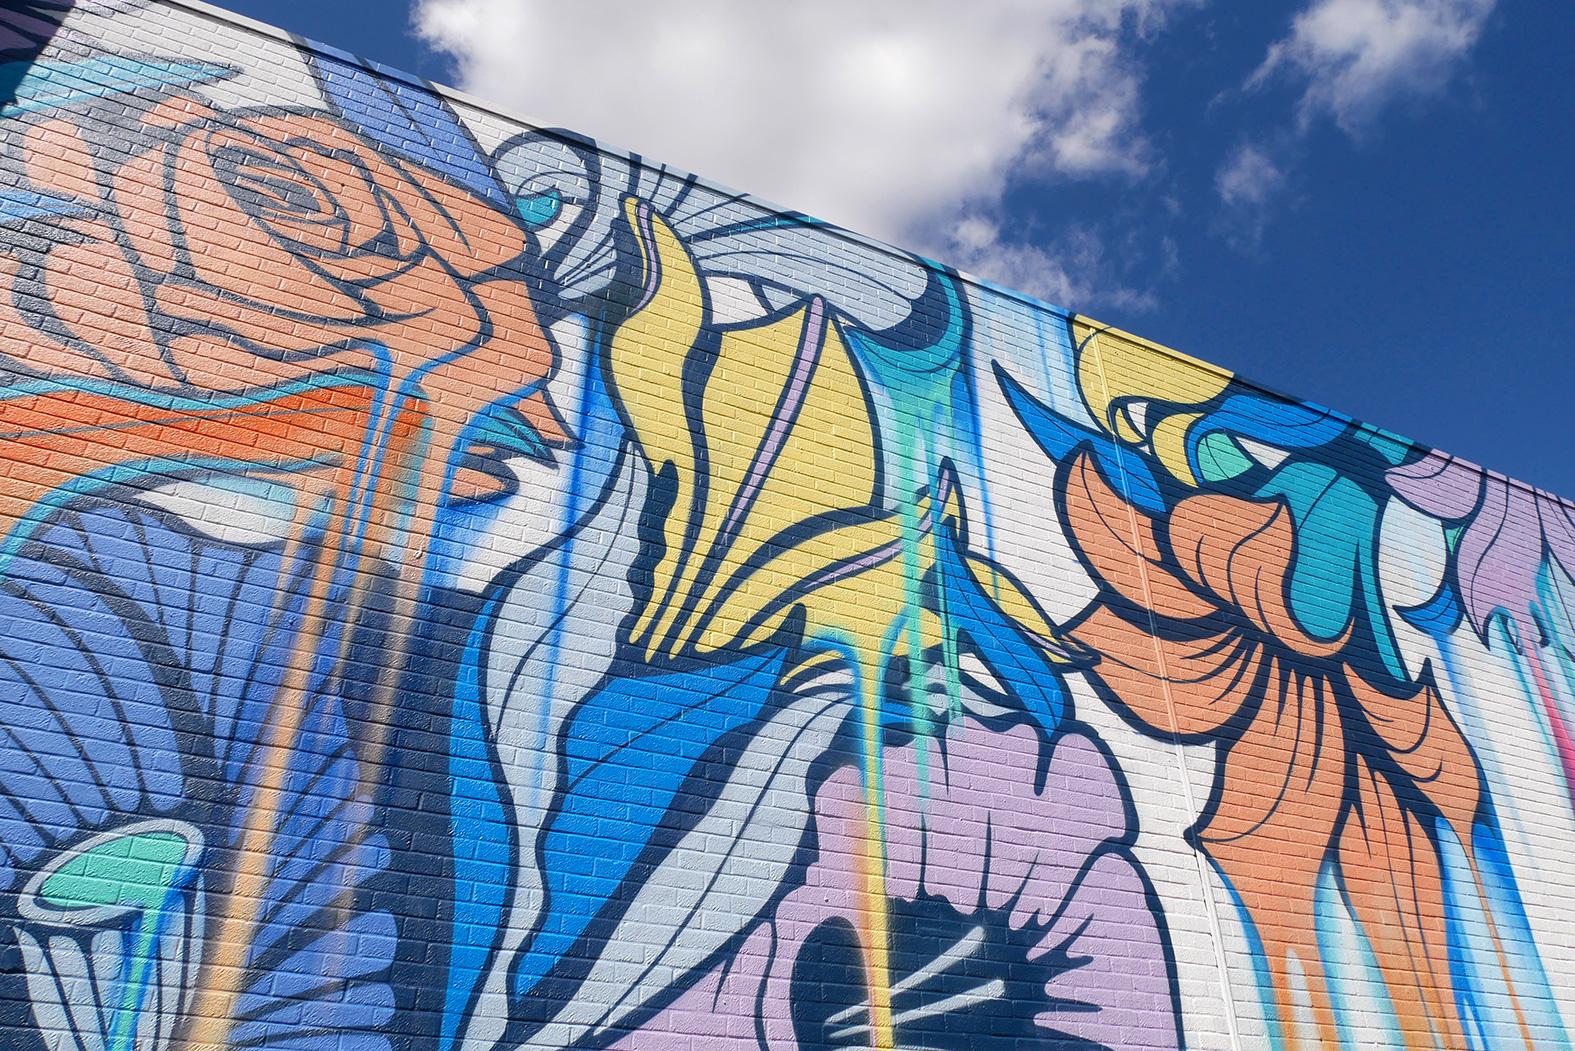 Nerone-mural-chance-street-26